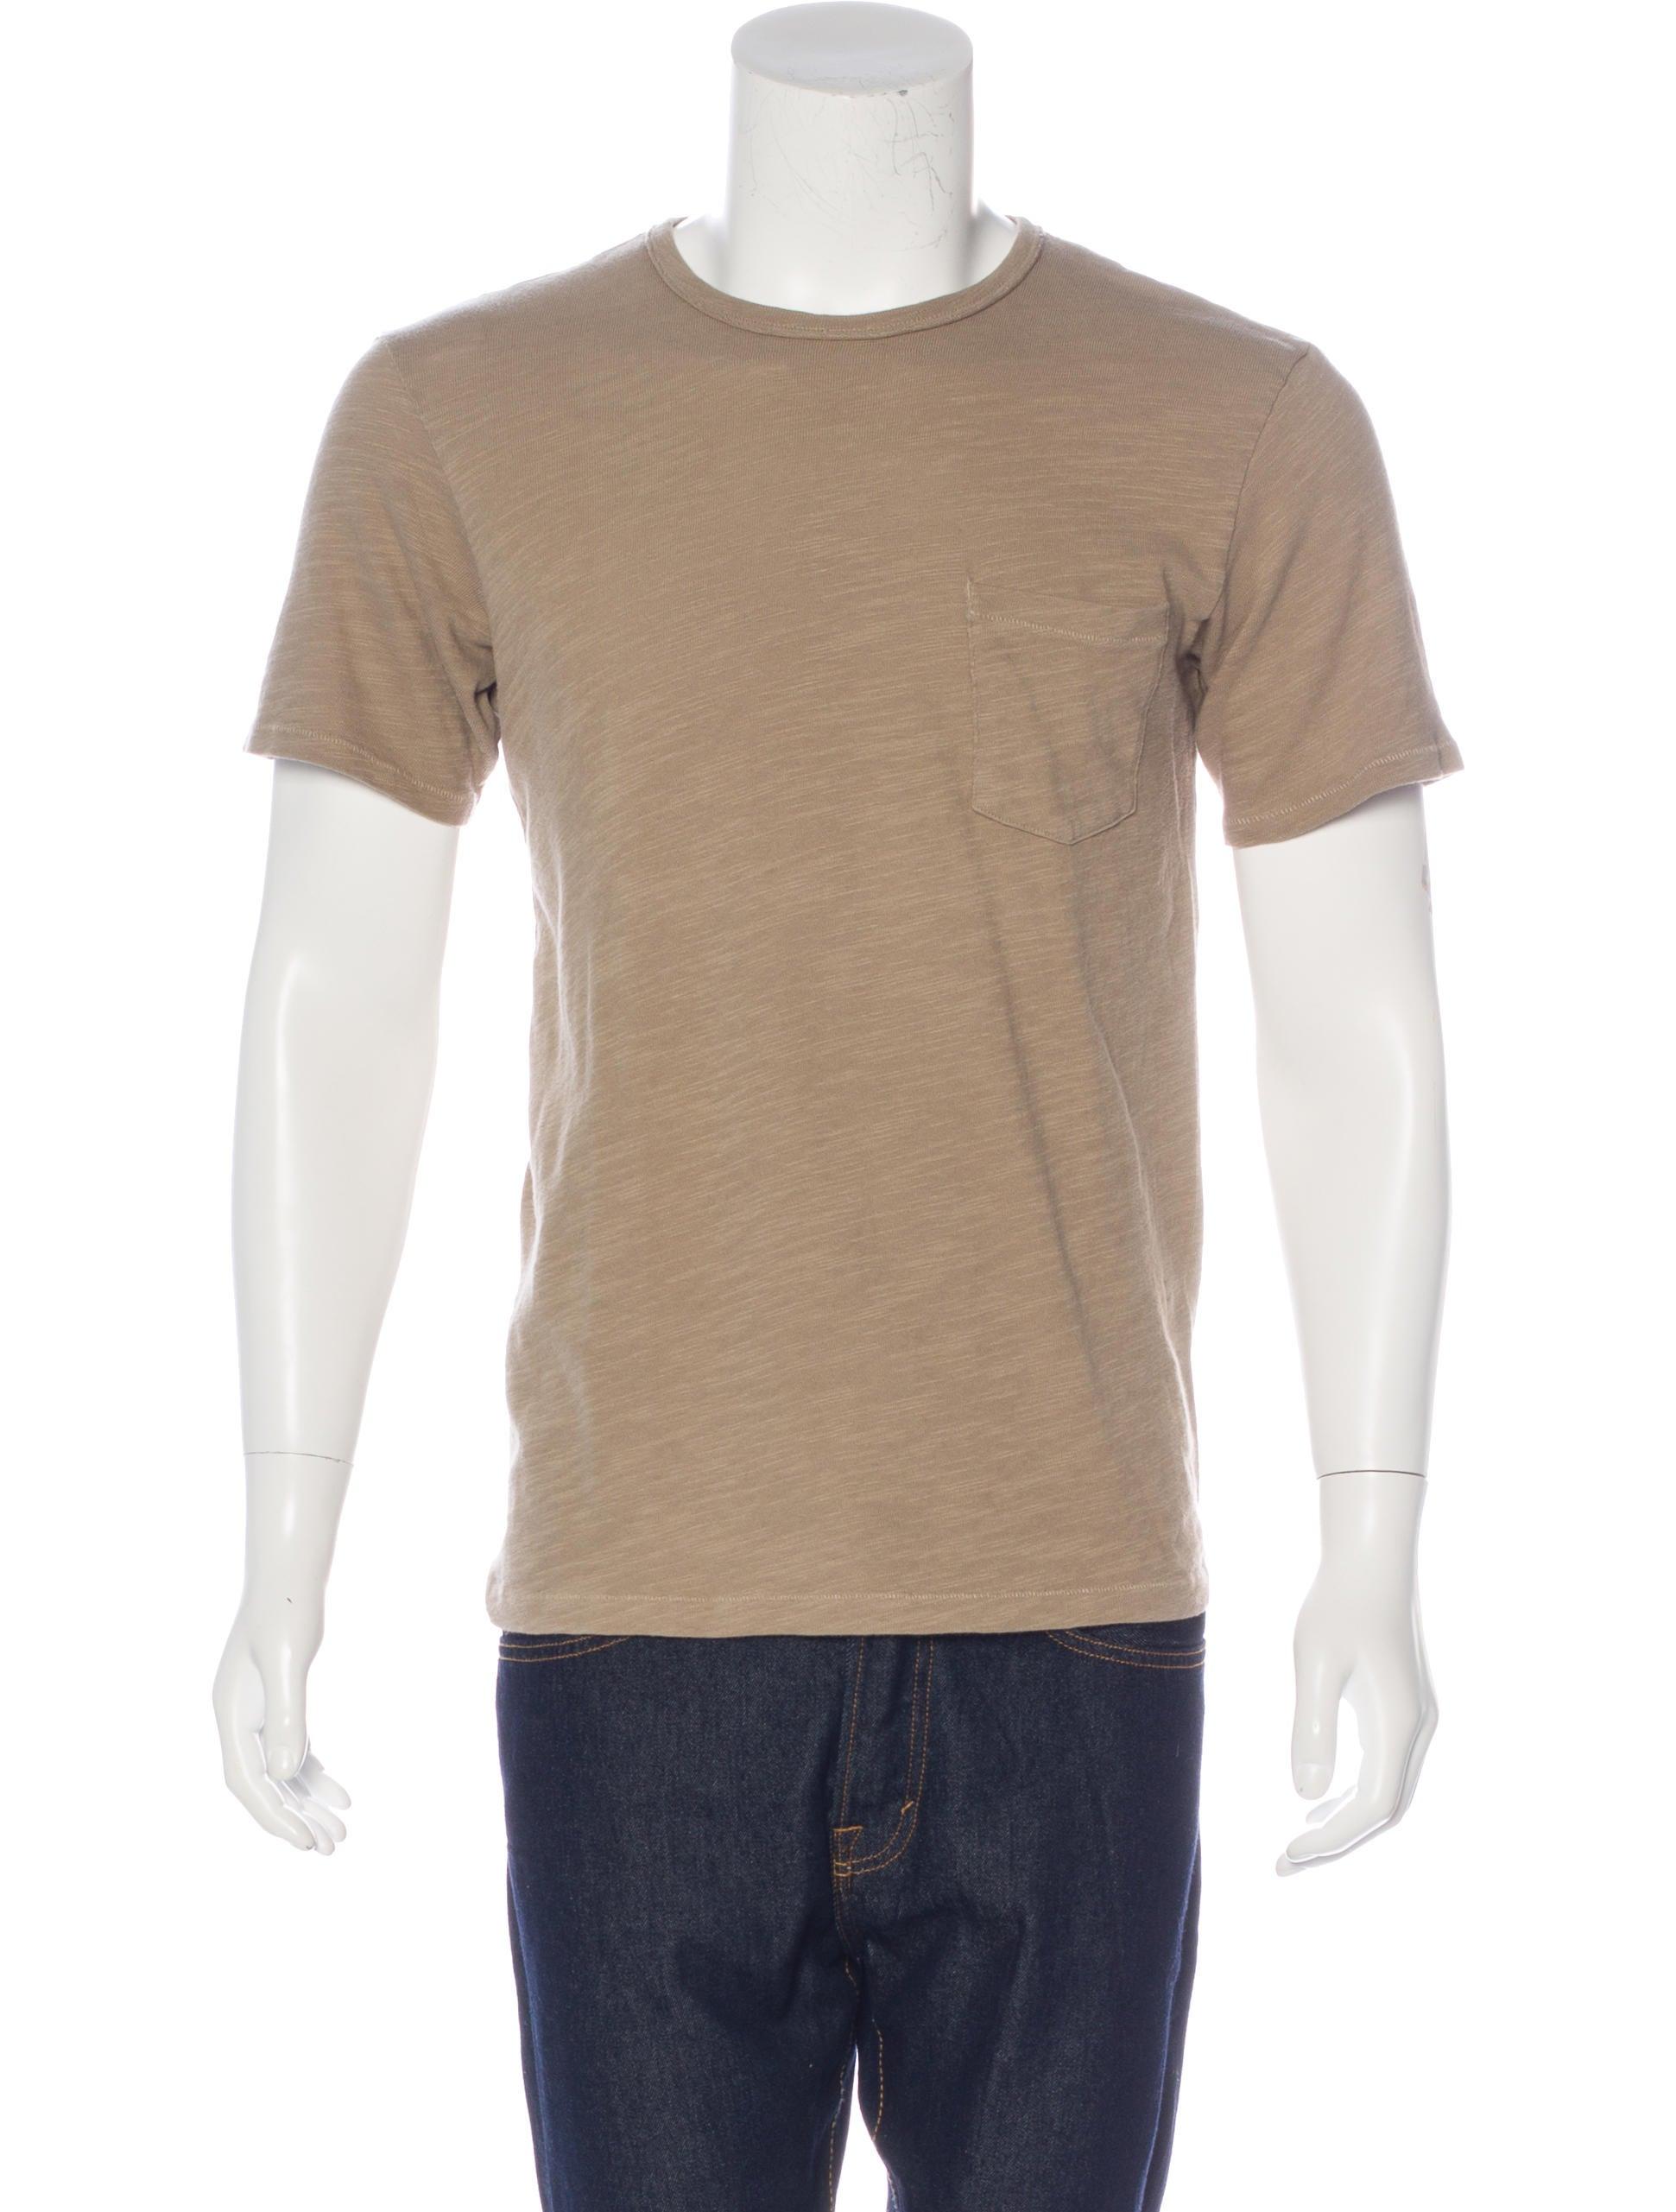 Rag bone crew neck t shirt clothing wragb74786 the for Rag and bone t shirts